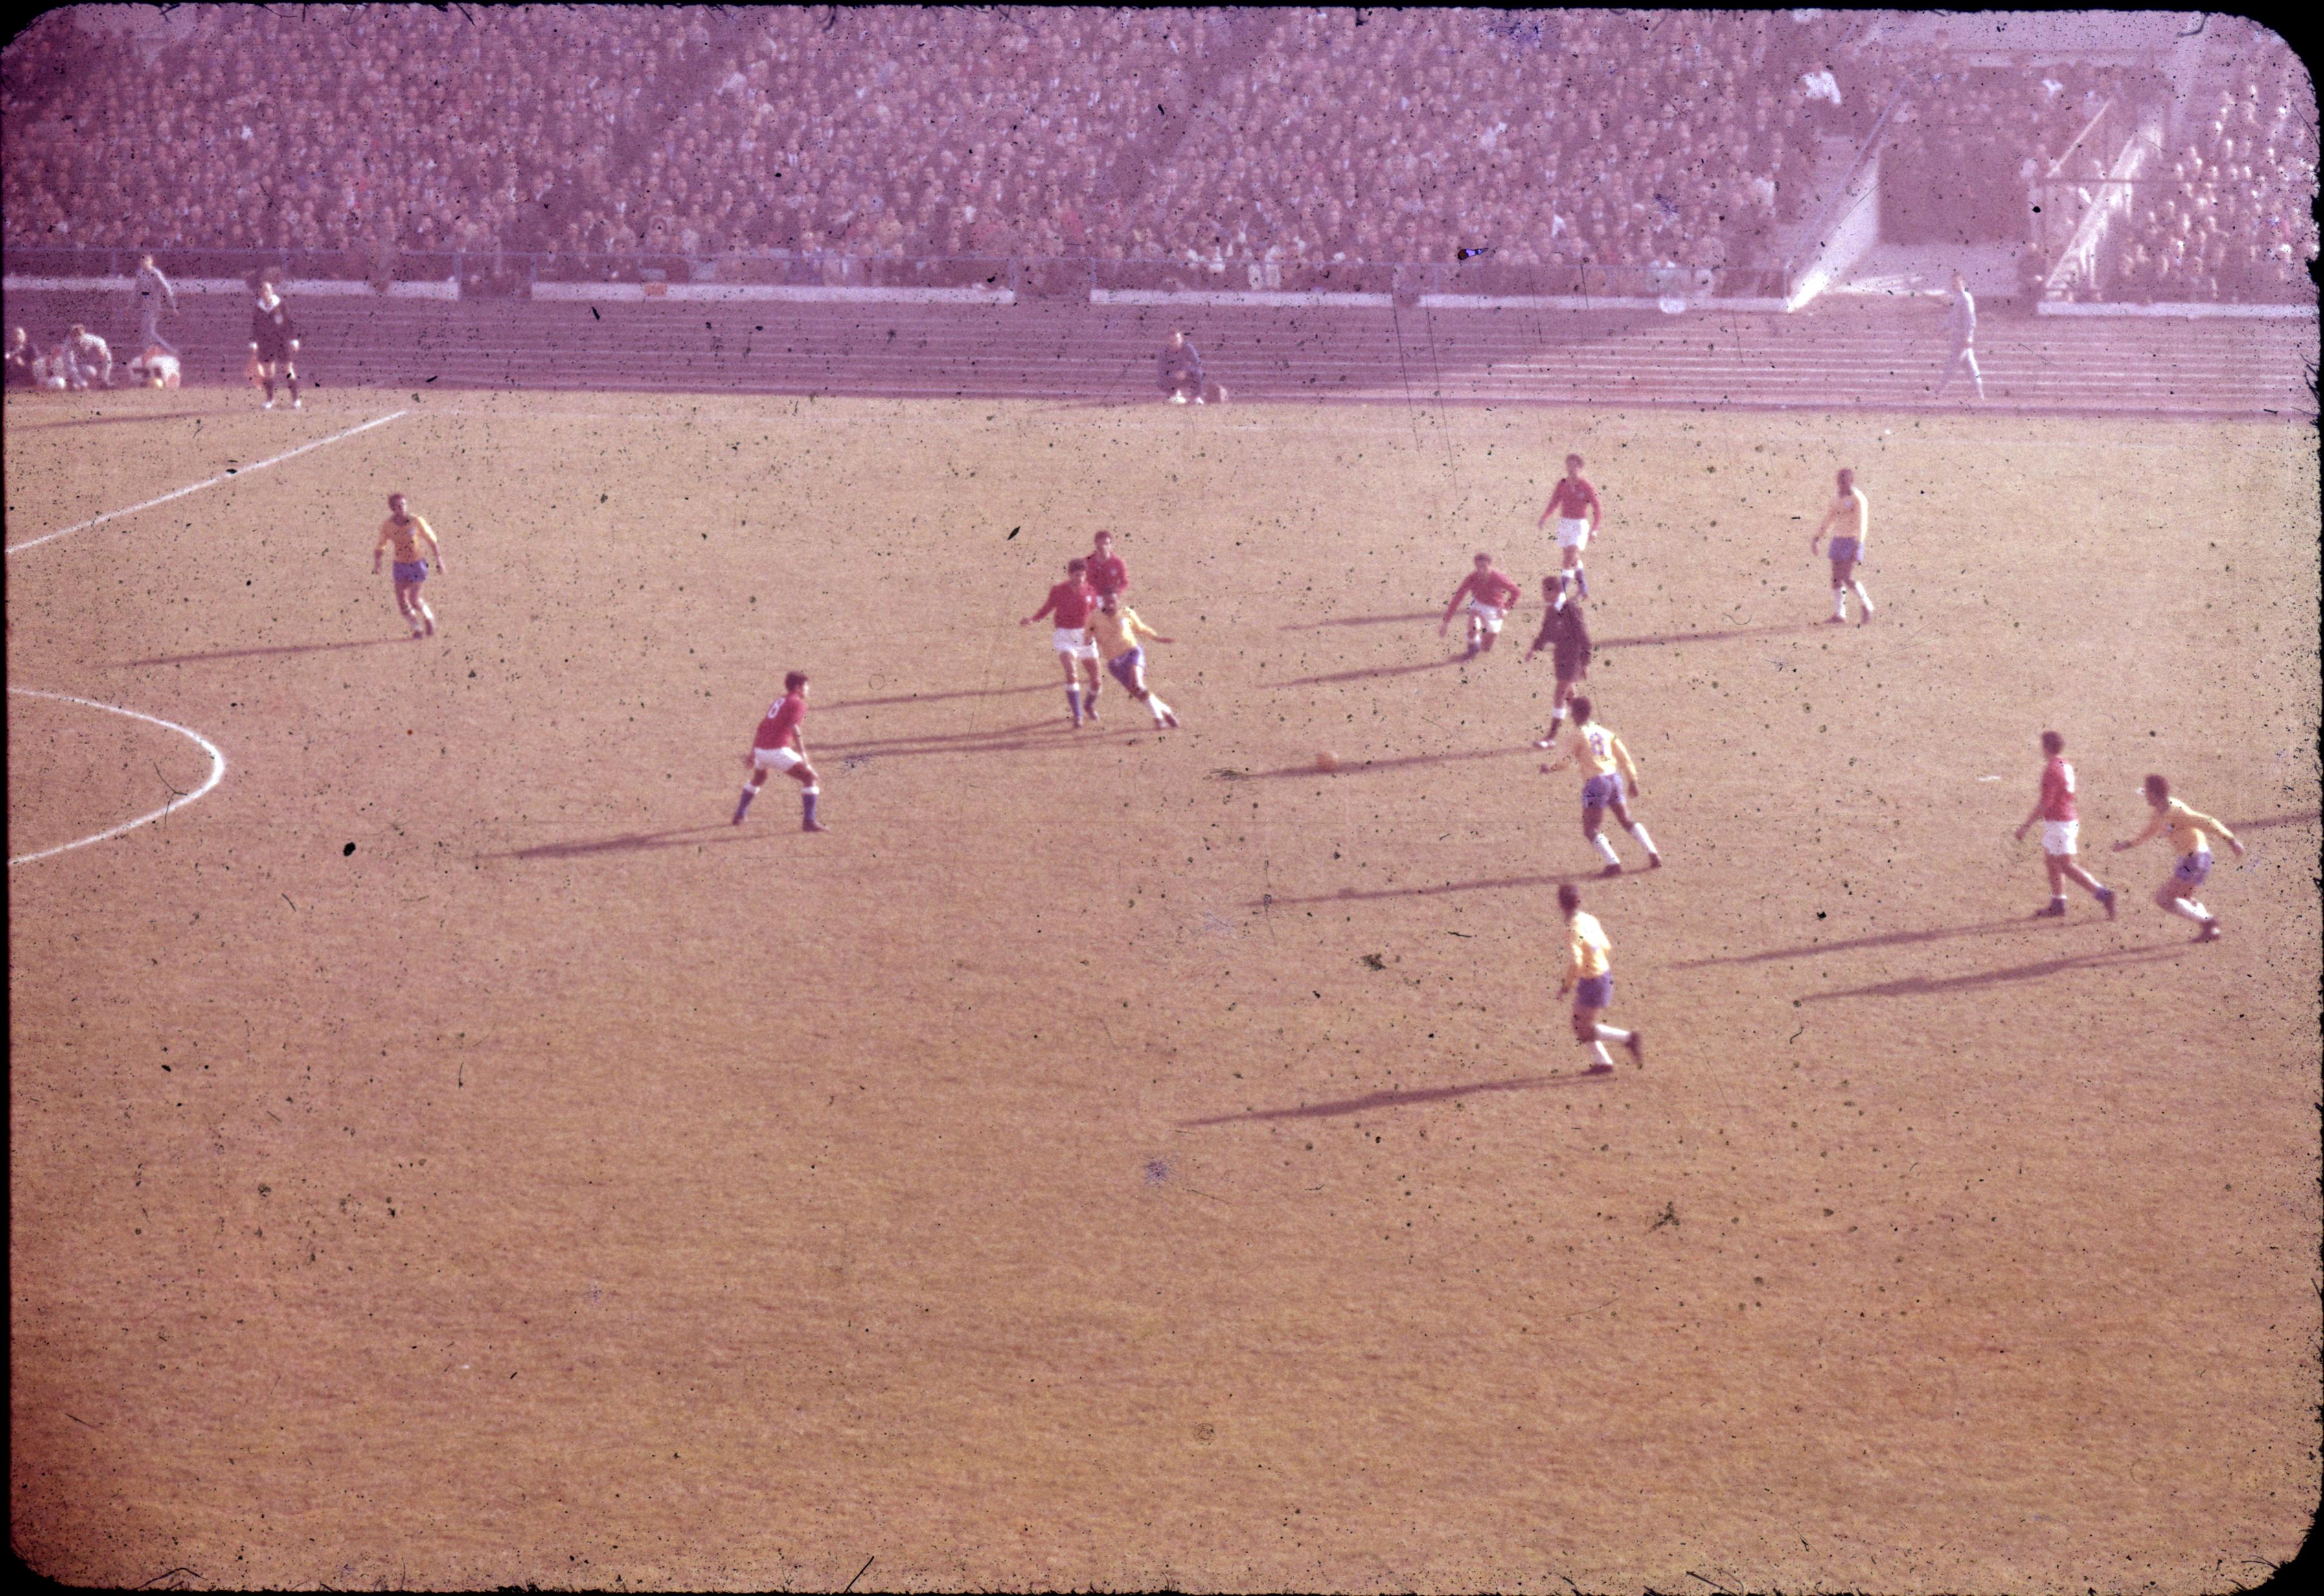 Enterreno - Fotos históricas de chile - fotos antiguas de Chile - Mundial Chile 1962, Estadio Nacional